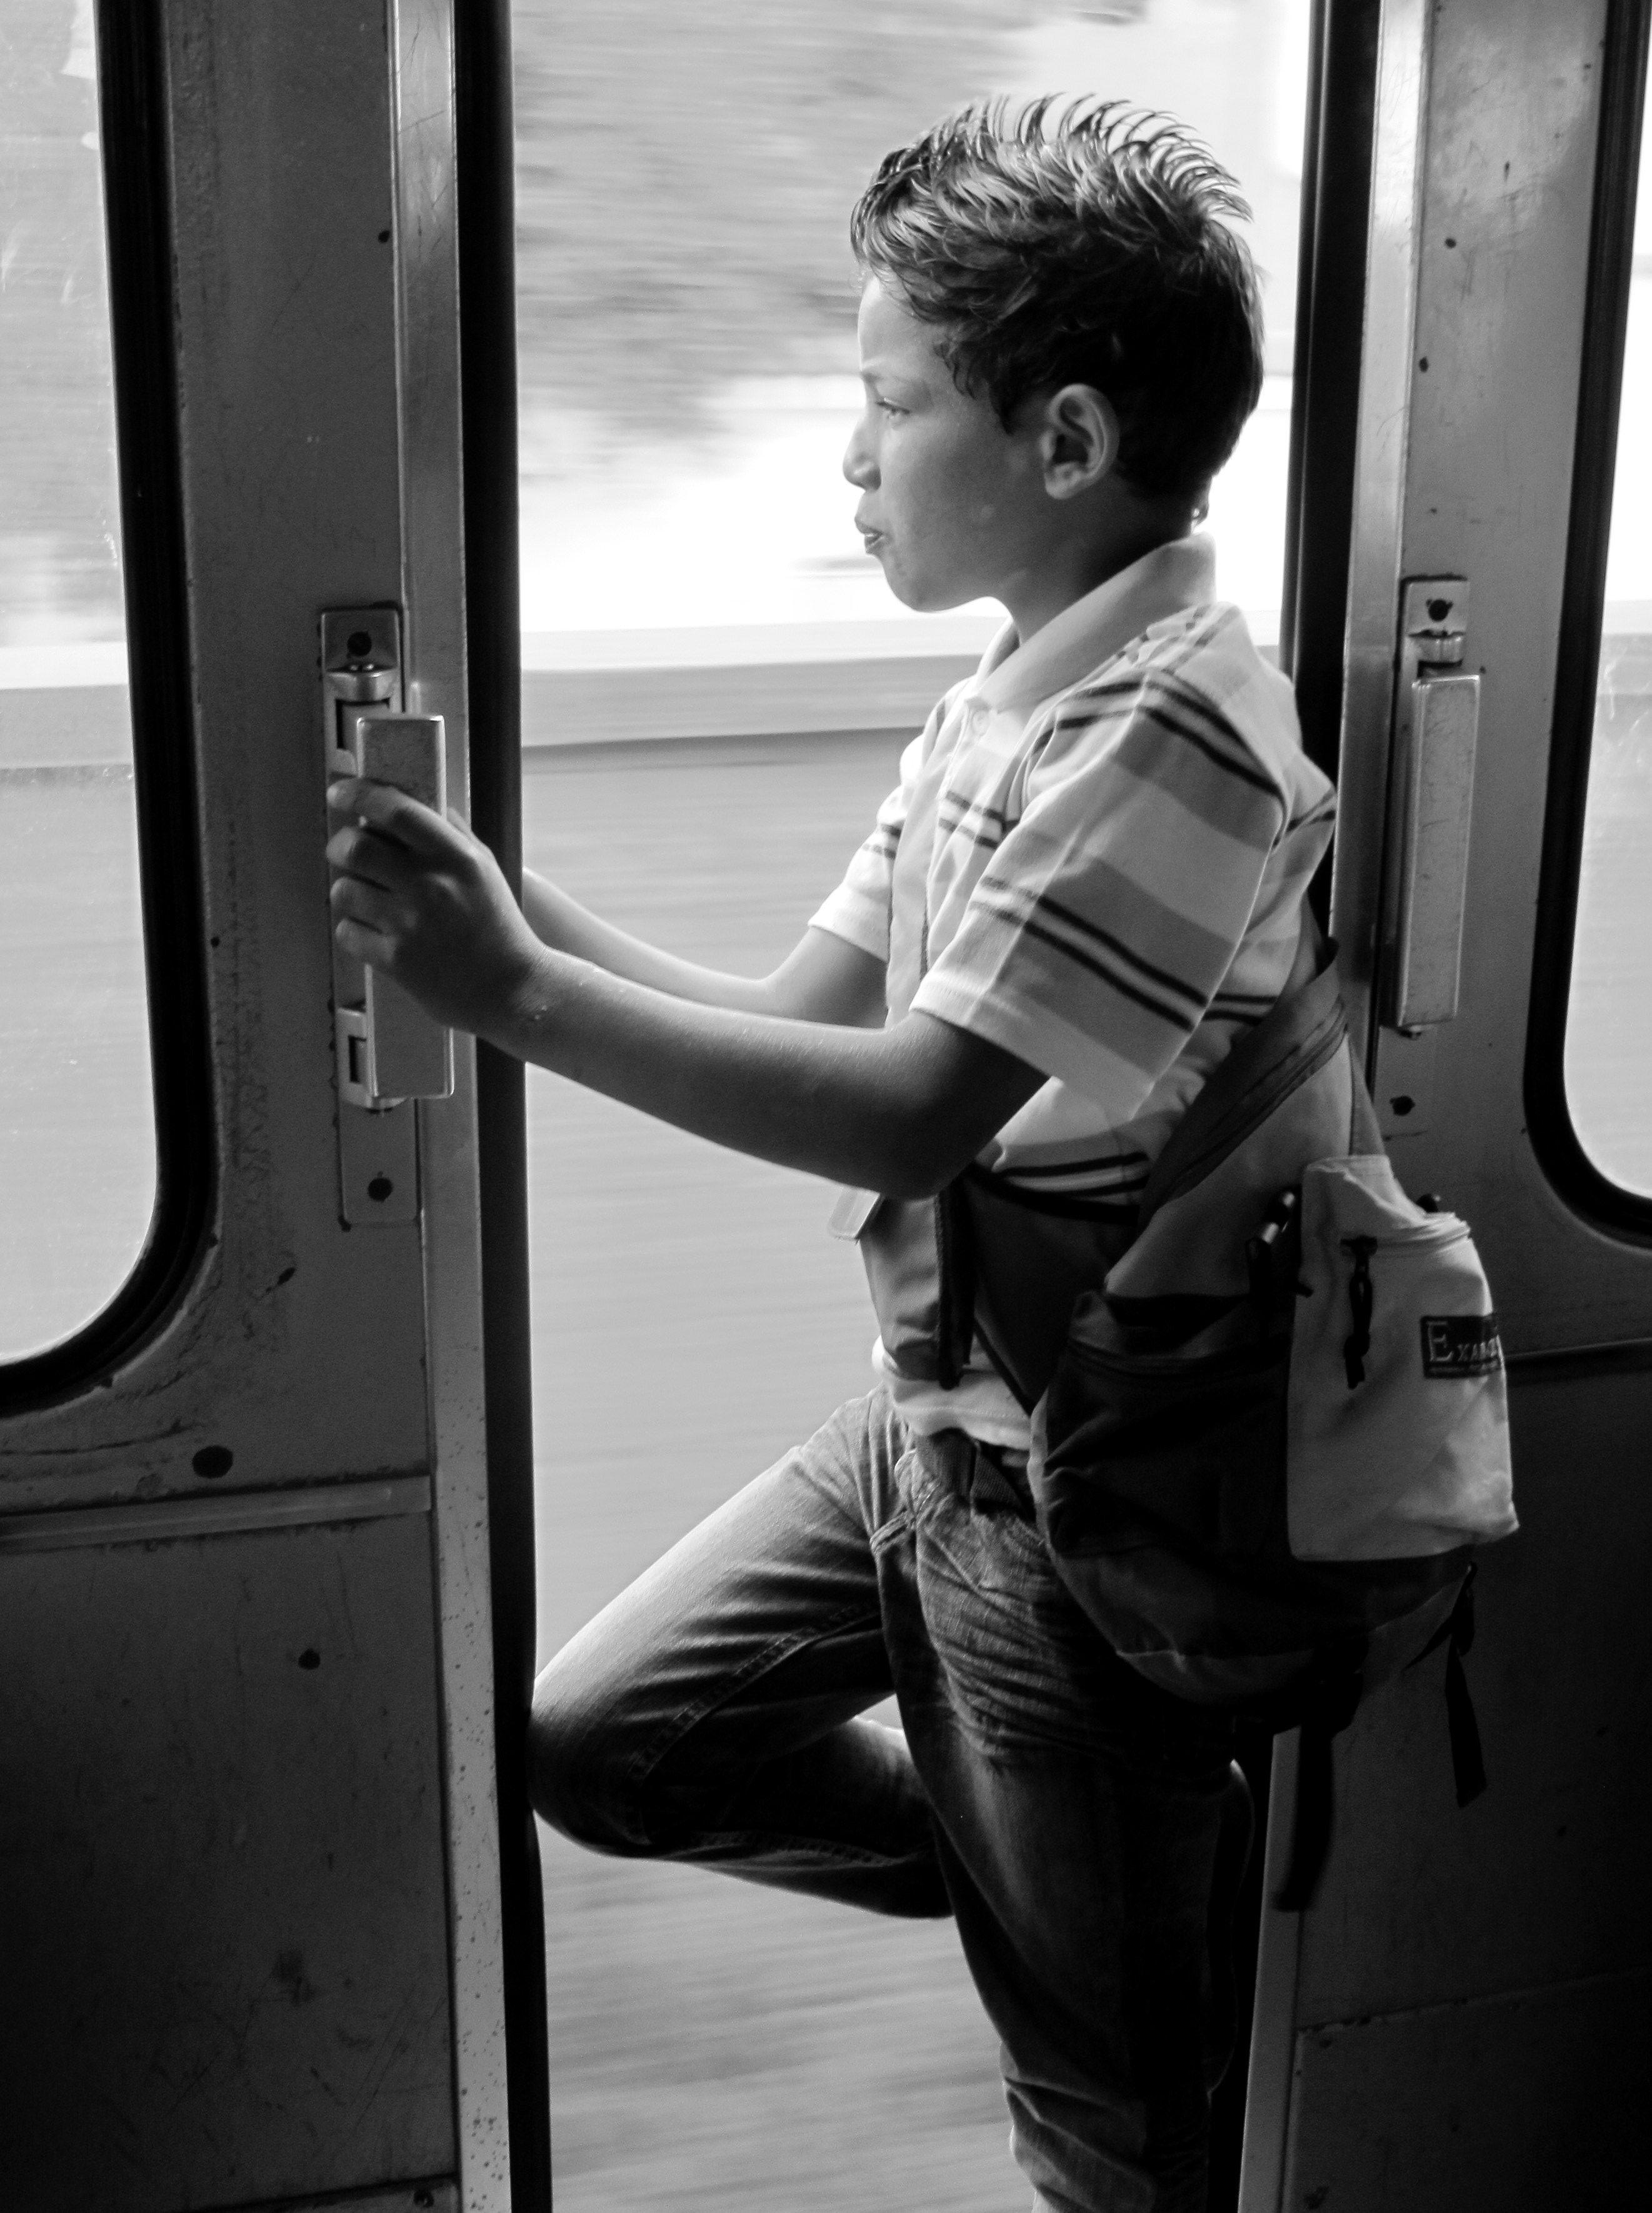 Train ride, Tunisian-style.